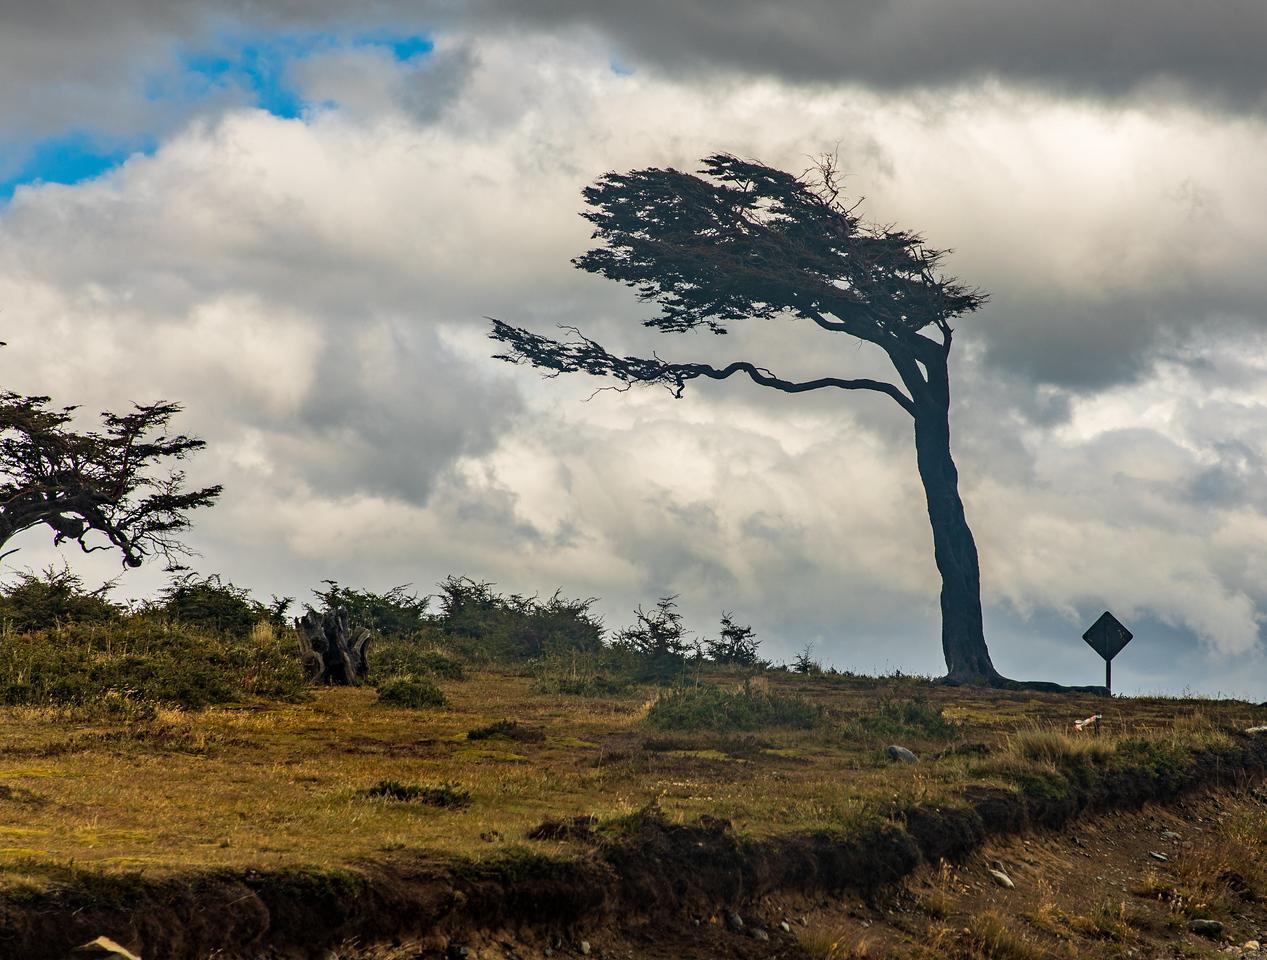 Patagonian Winds Carve The Landscape